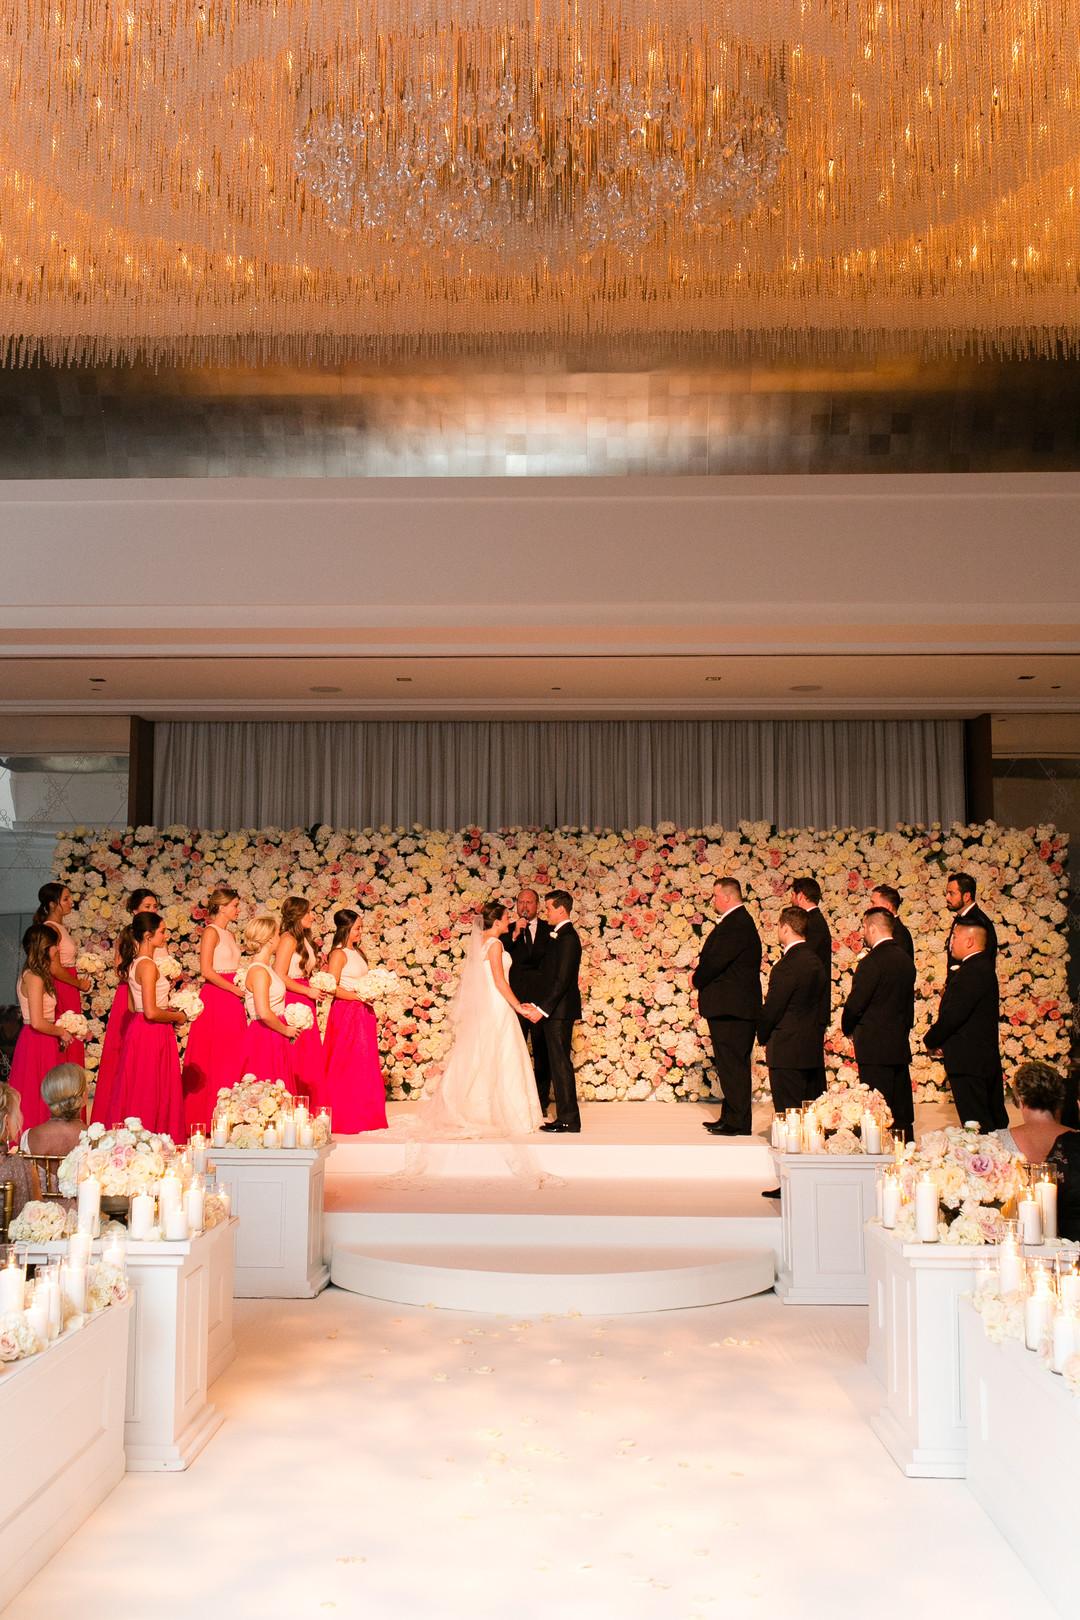 Chicago Wedding Ceremony The Ritz Carlton Emilia Jane Photography